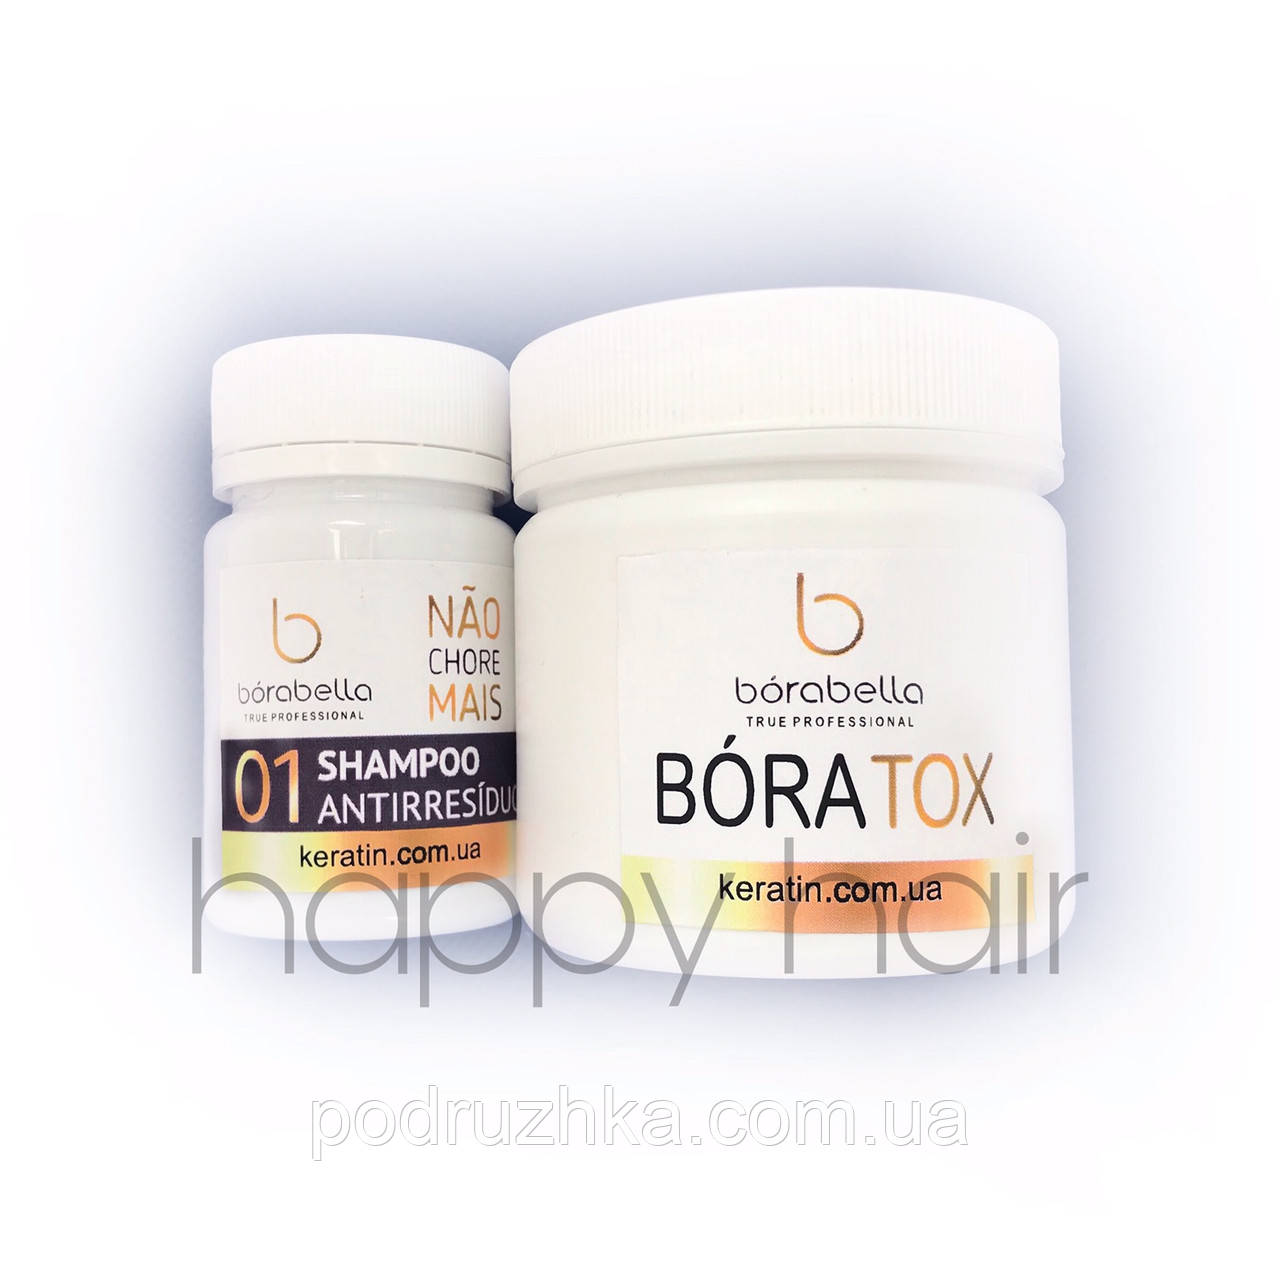 Borabella Organic Boratox Набор ботекс для волос100/200 г